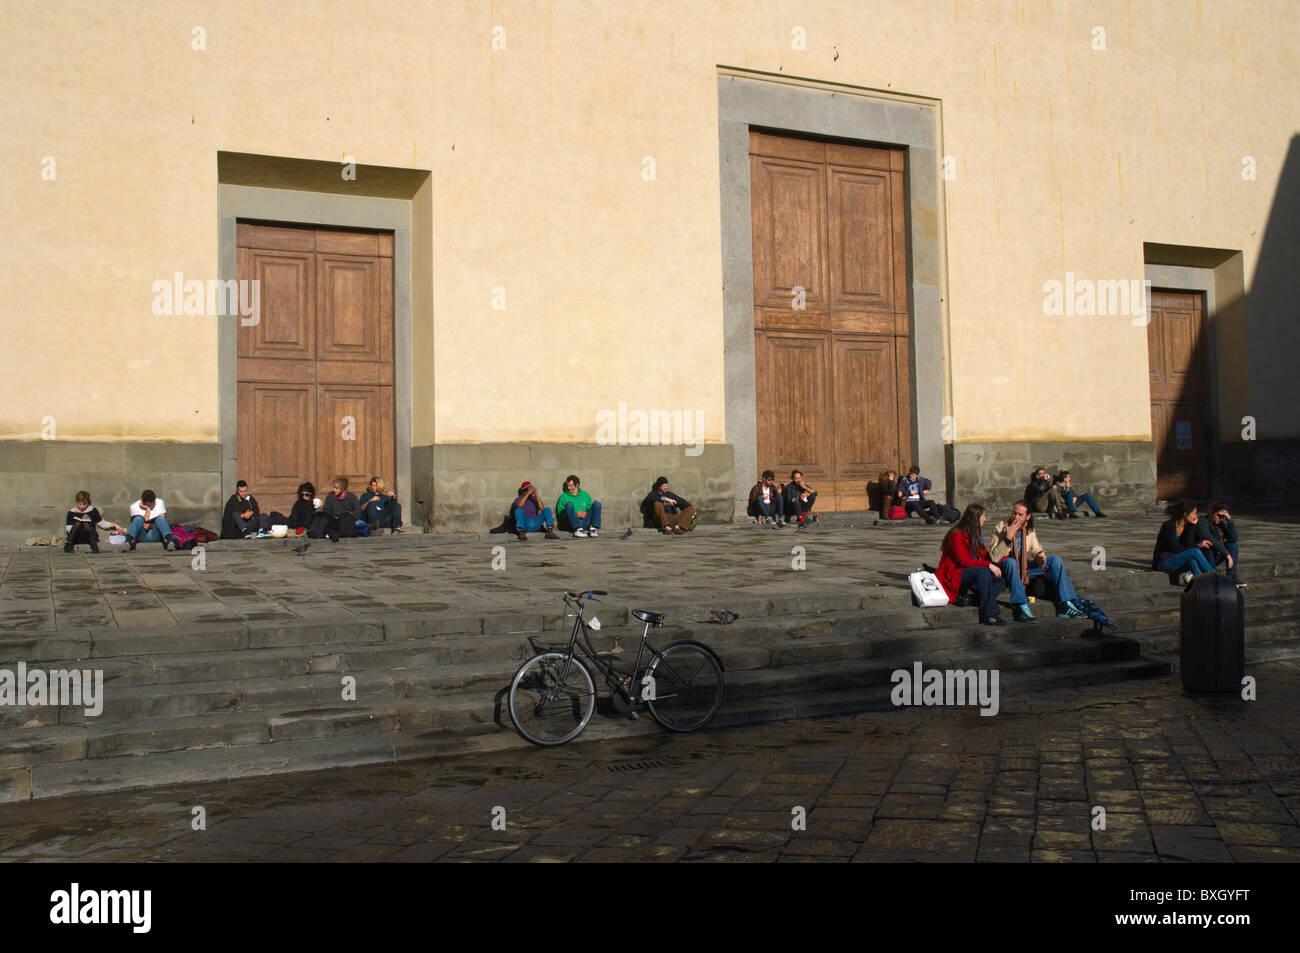 Basilica of Santo Spirito in Santo Spirito district central Florence (Firenze) Tuscany central Italy Europe - Stock Image